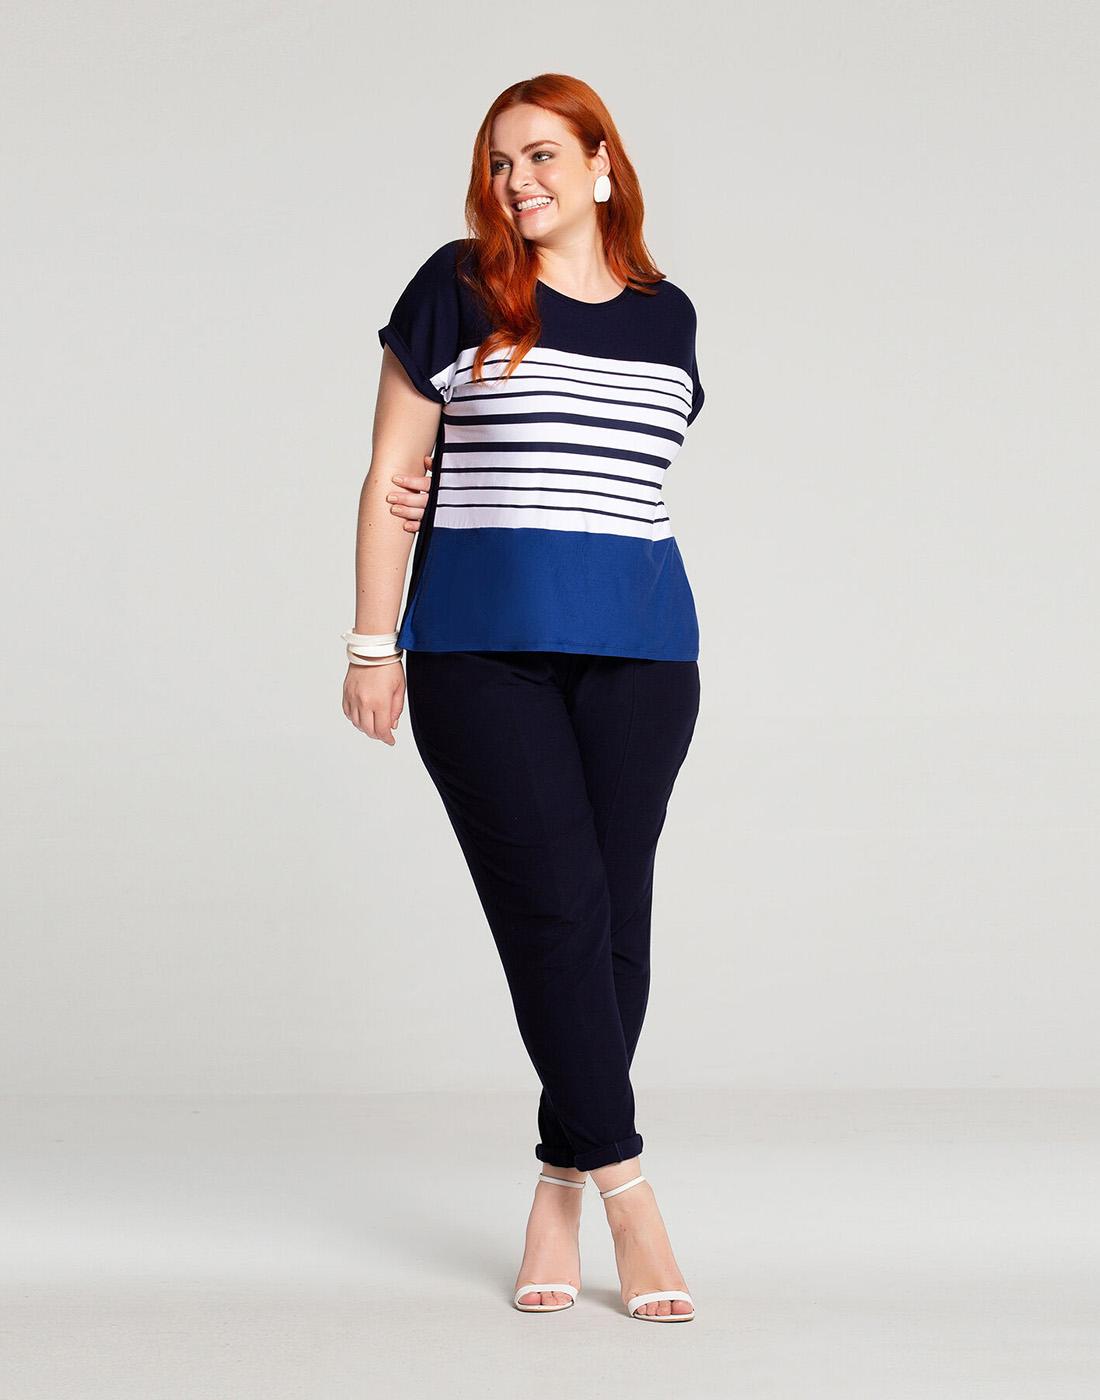 Blusa Listras Plus Size Malha Viscose Lunender Mais Mulher